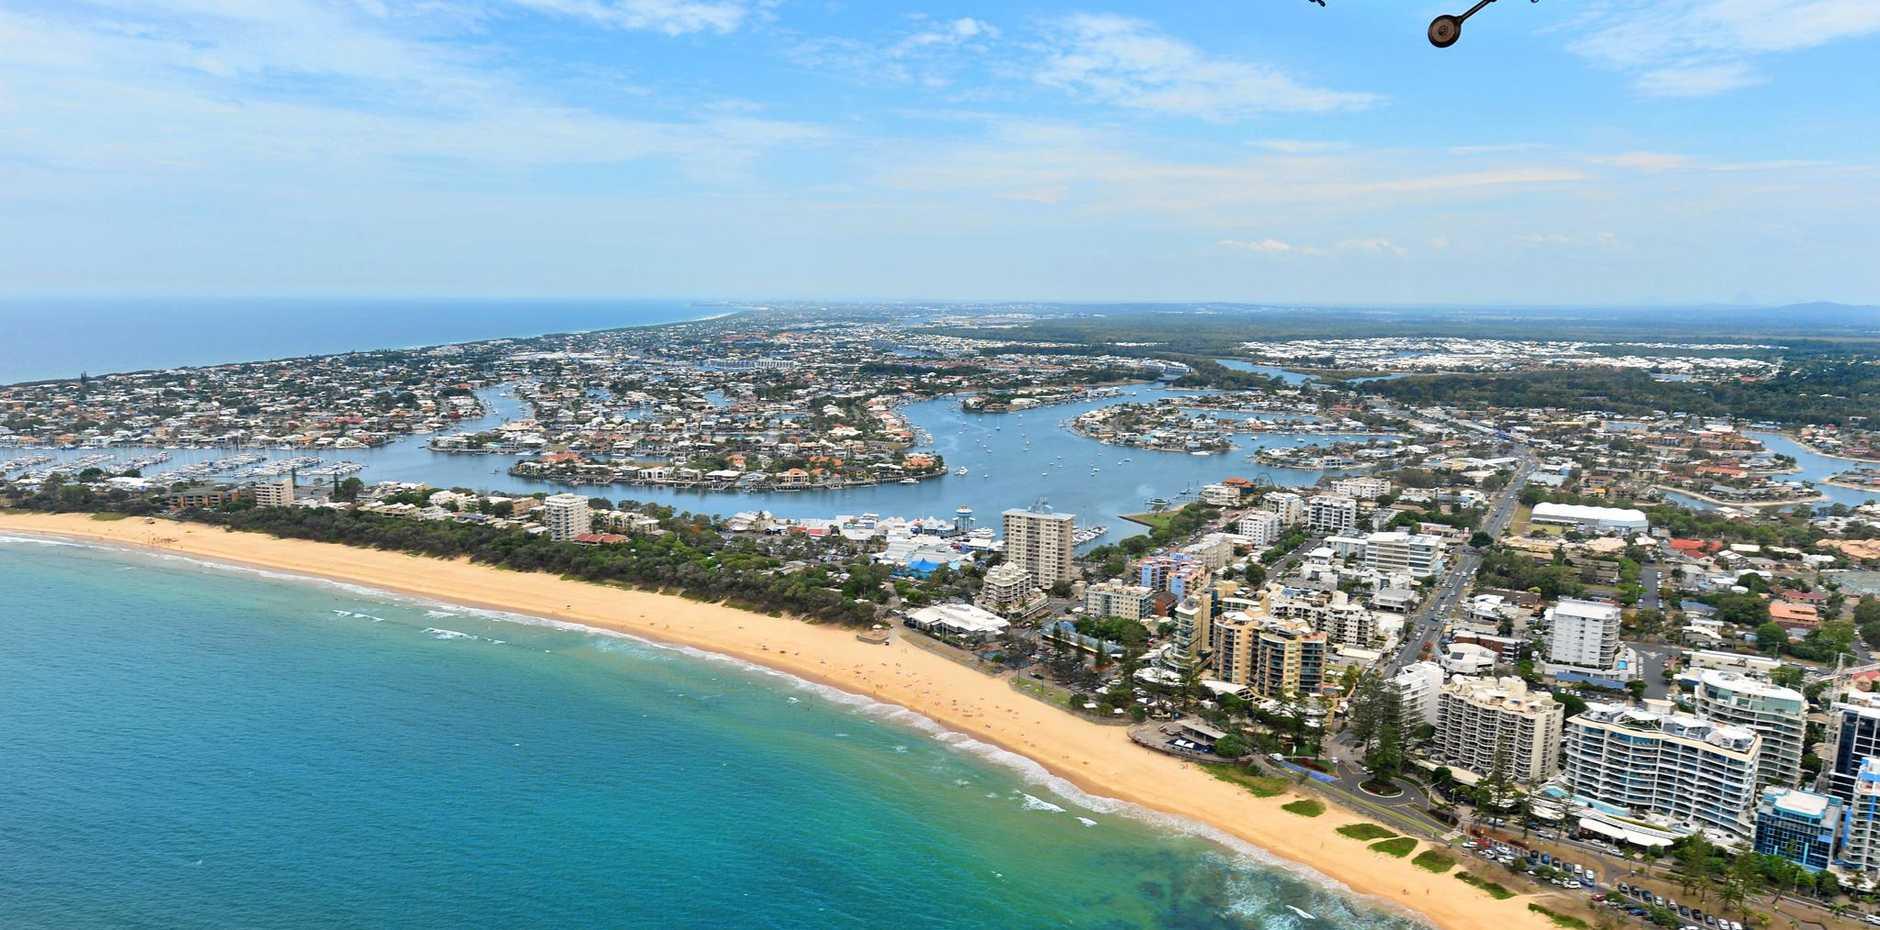 Aerial photographs of the Sunshine Coast.